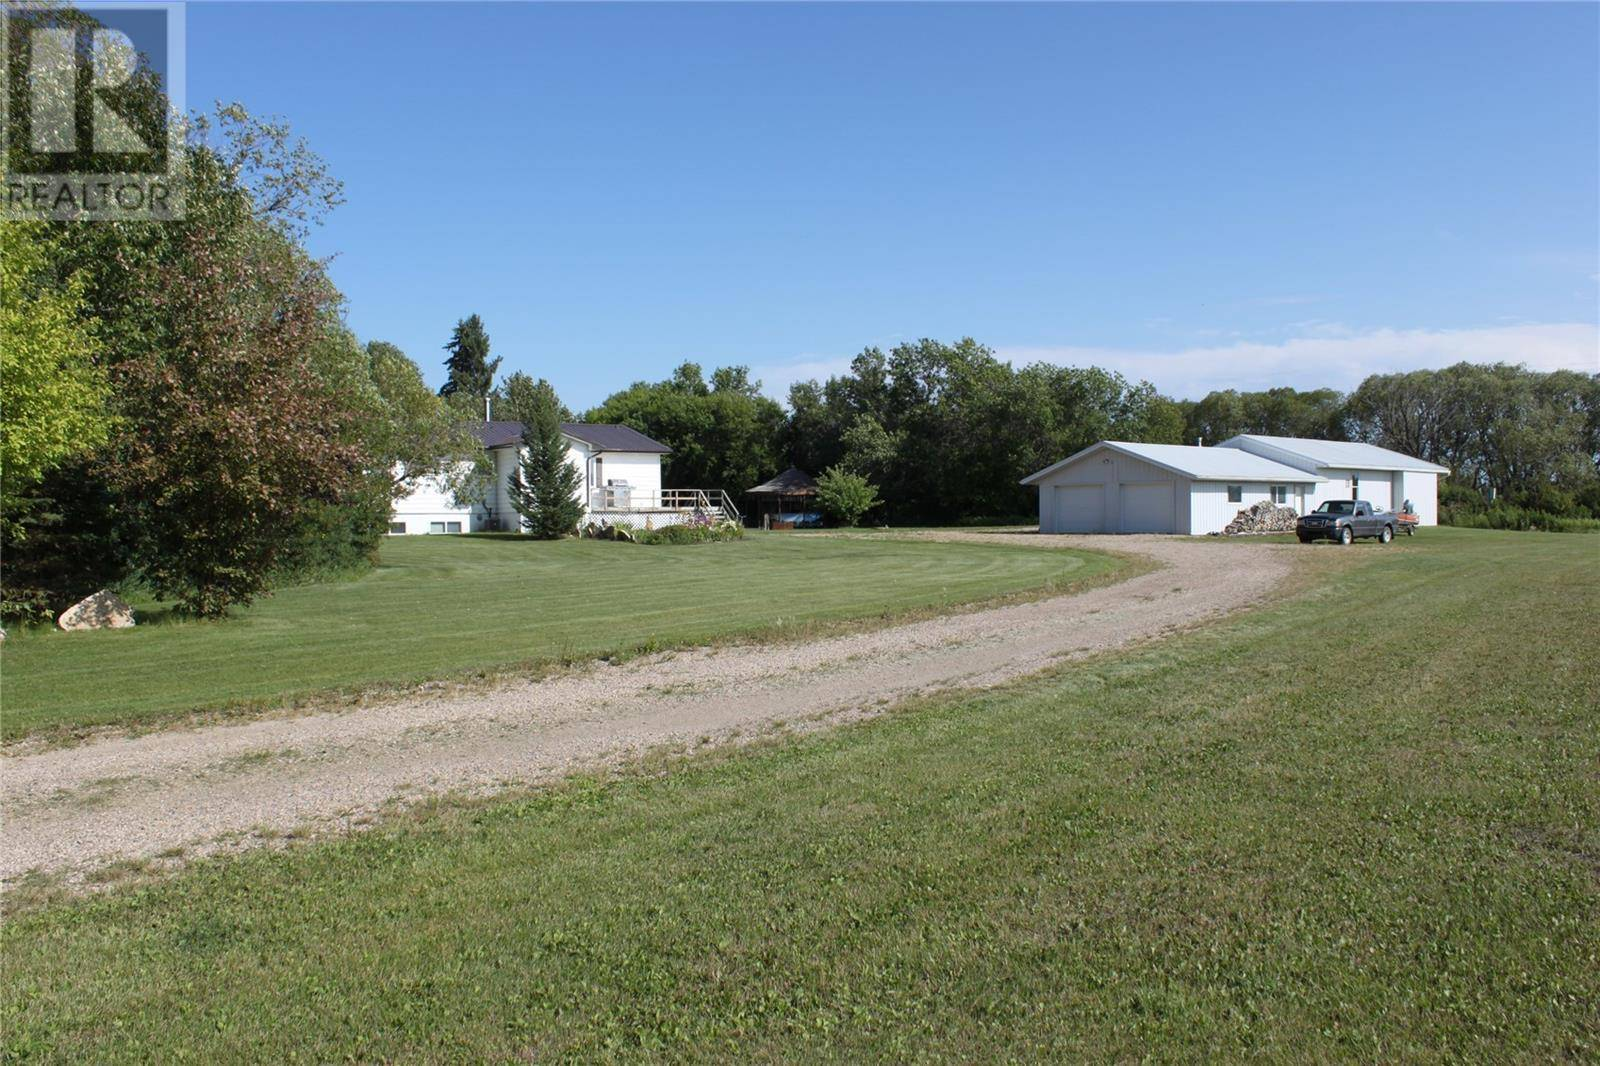 Keller Hobby Farm , Pleasantdale Rm No. 398 | Image 1